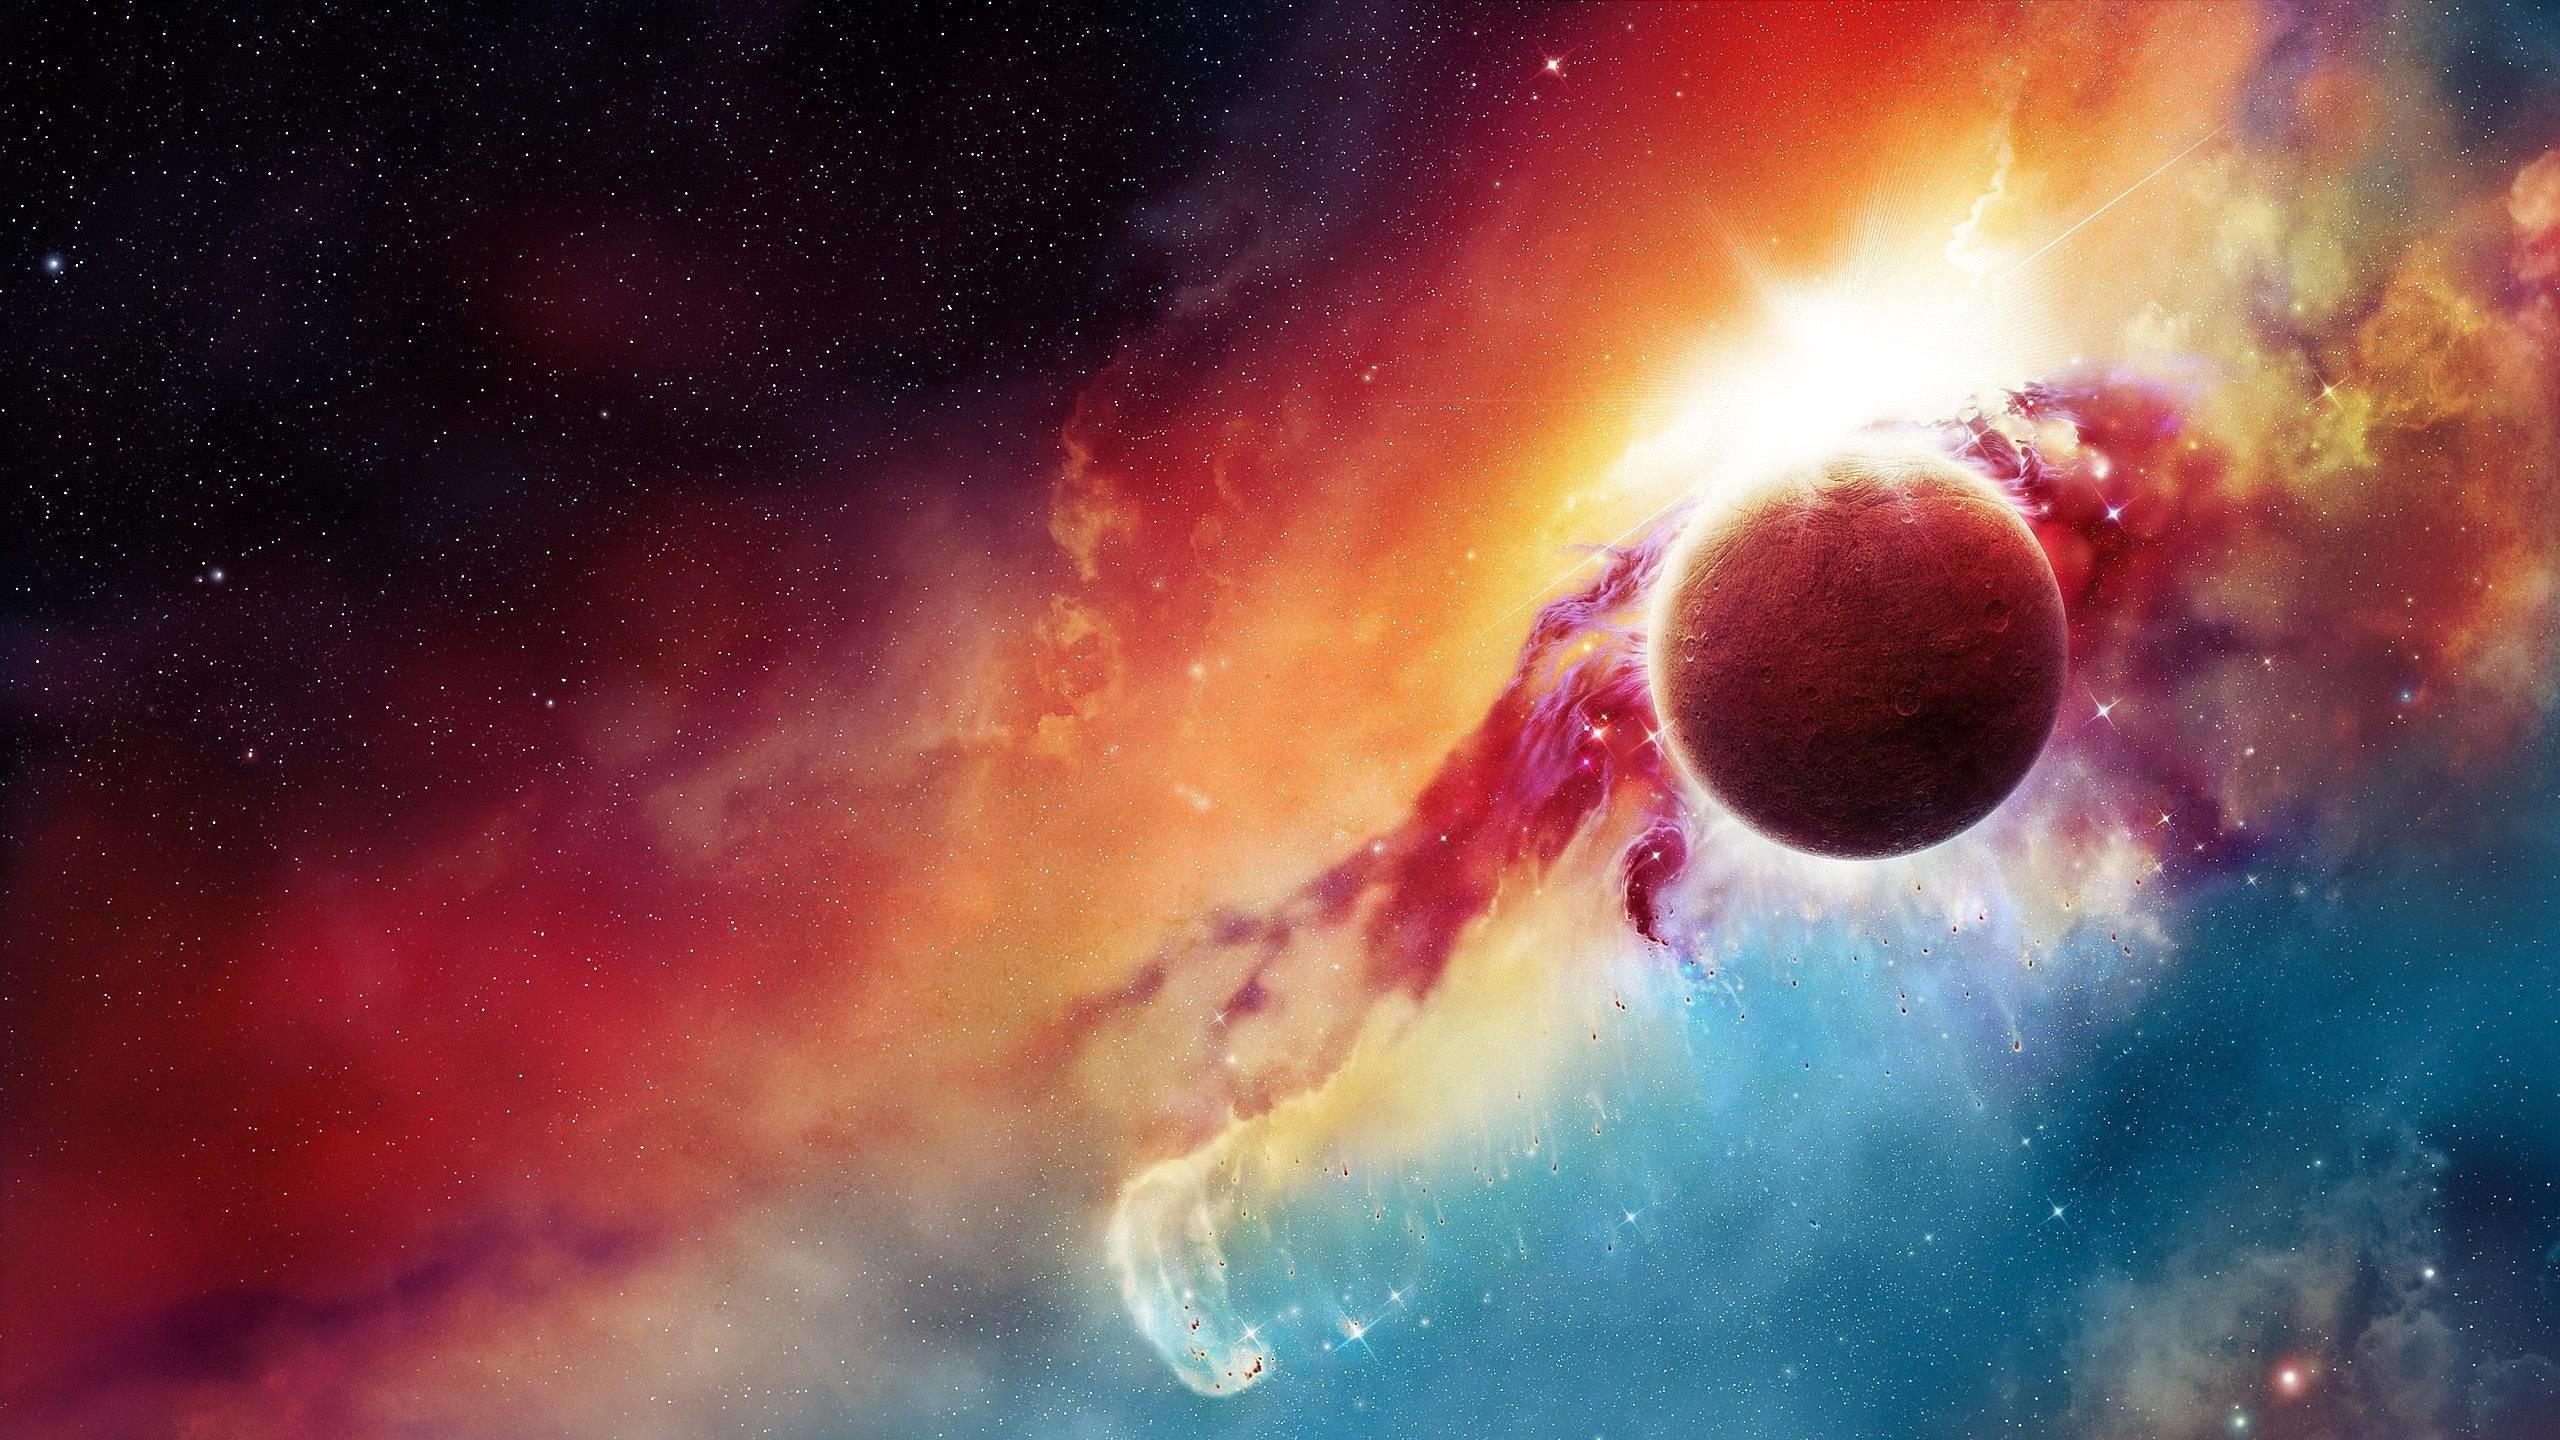 Space Star Dust Wallpaper